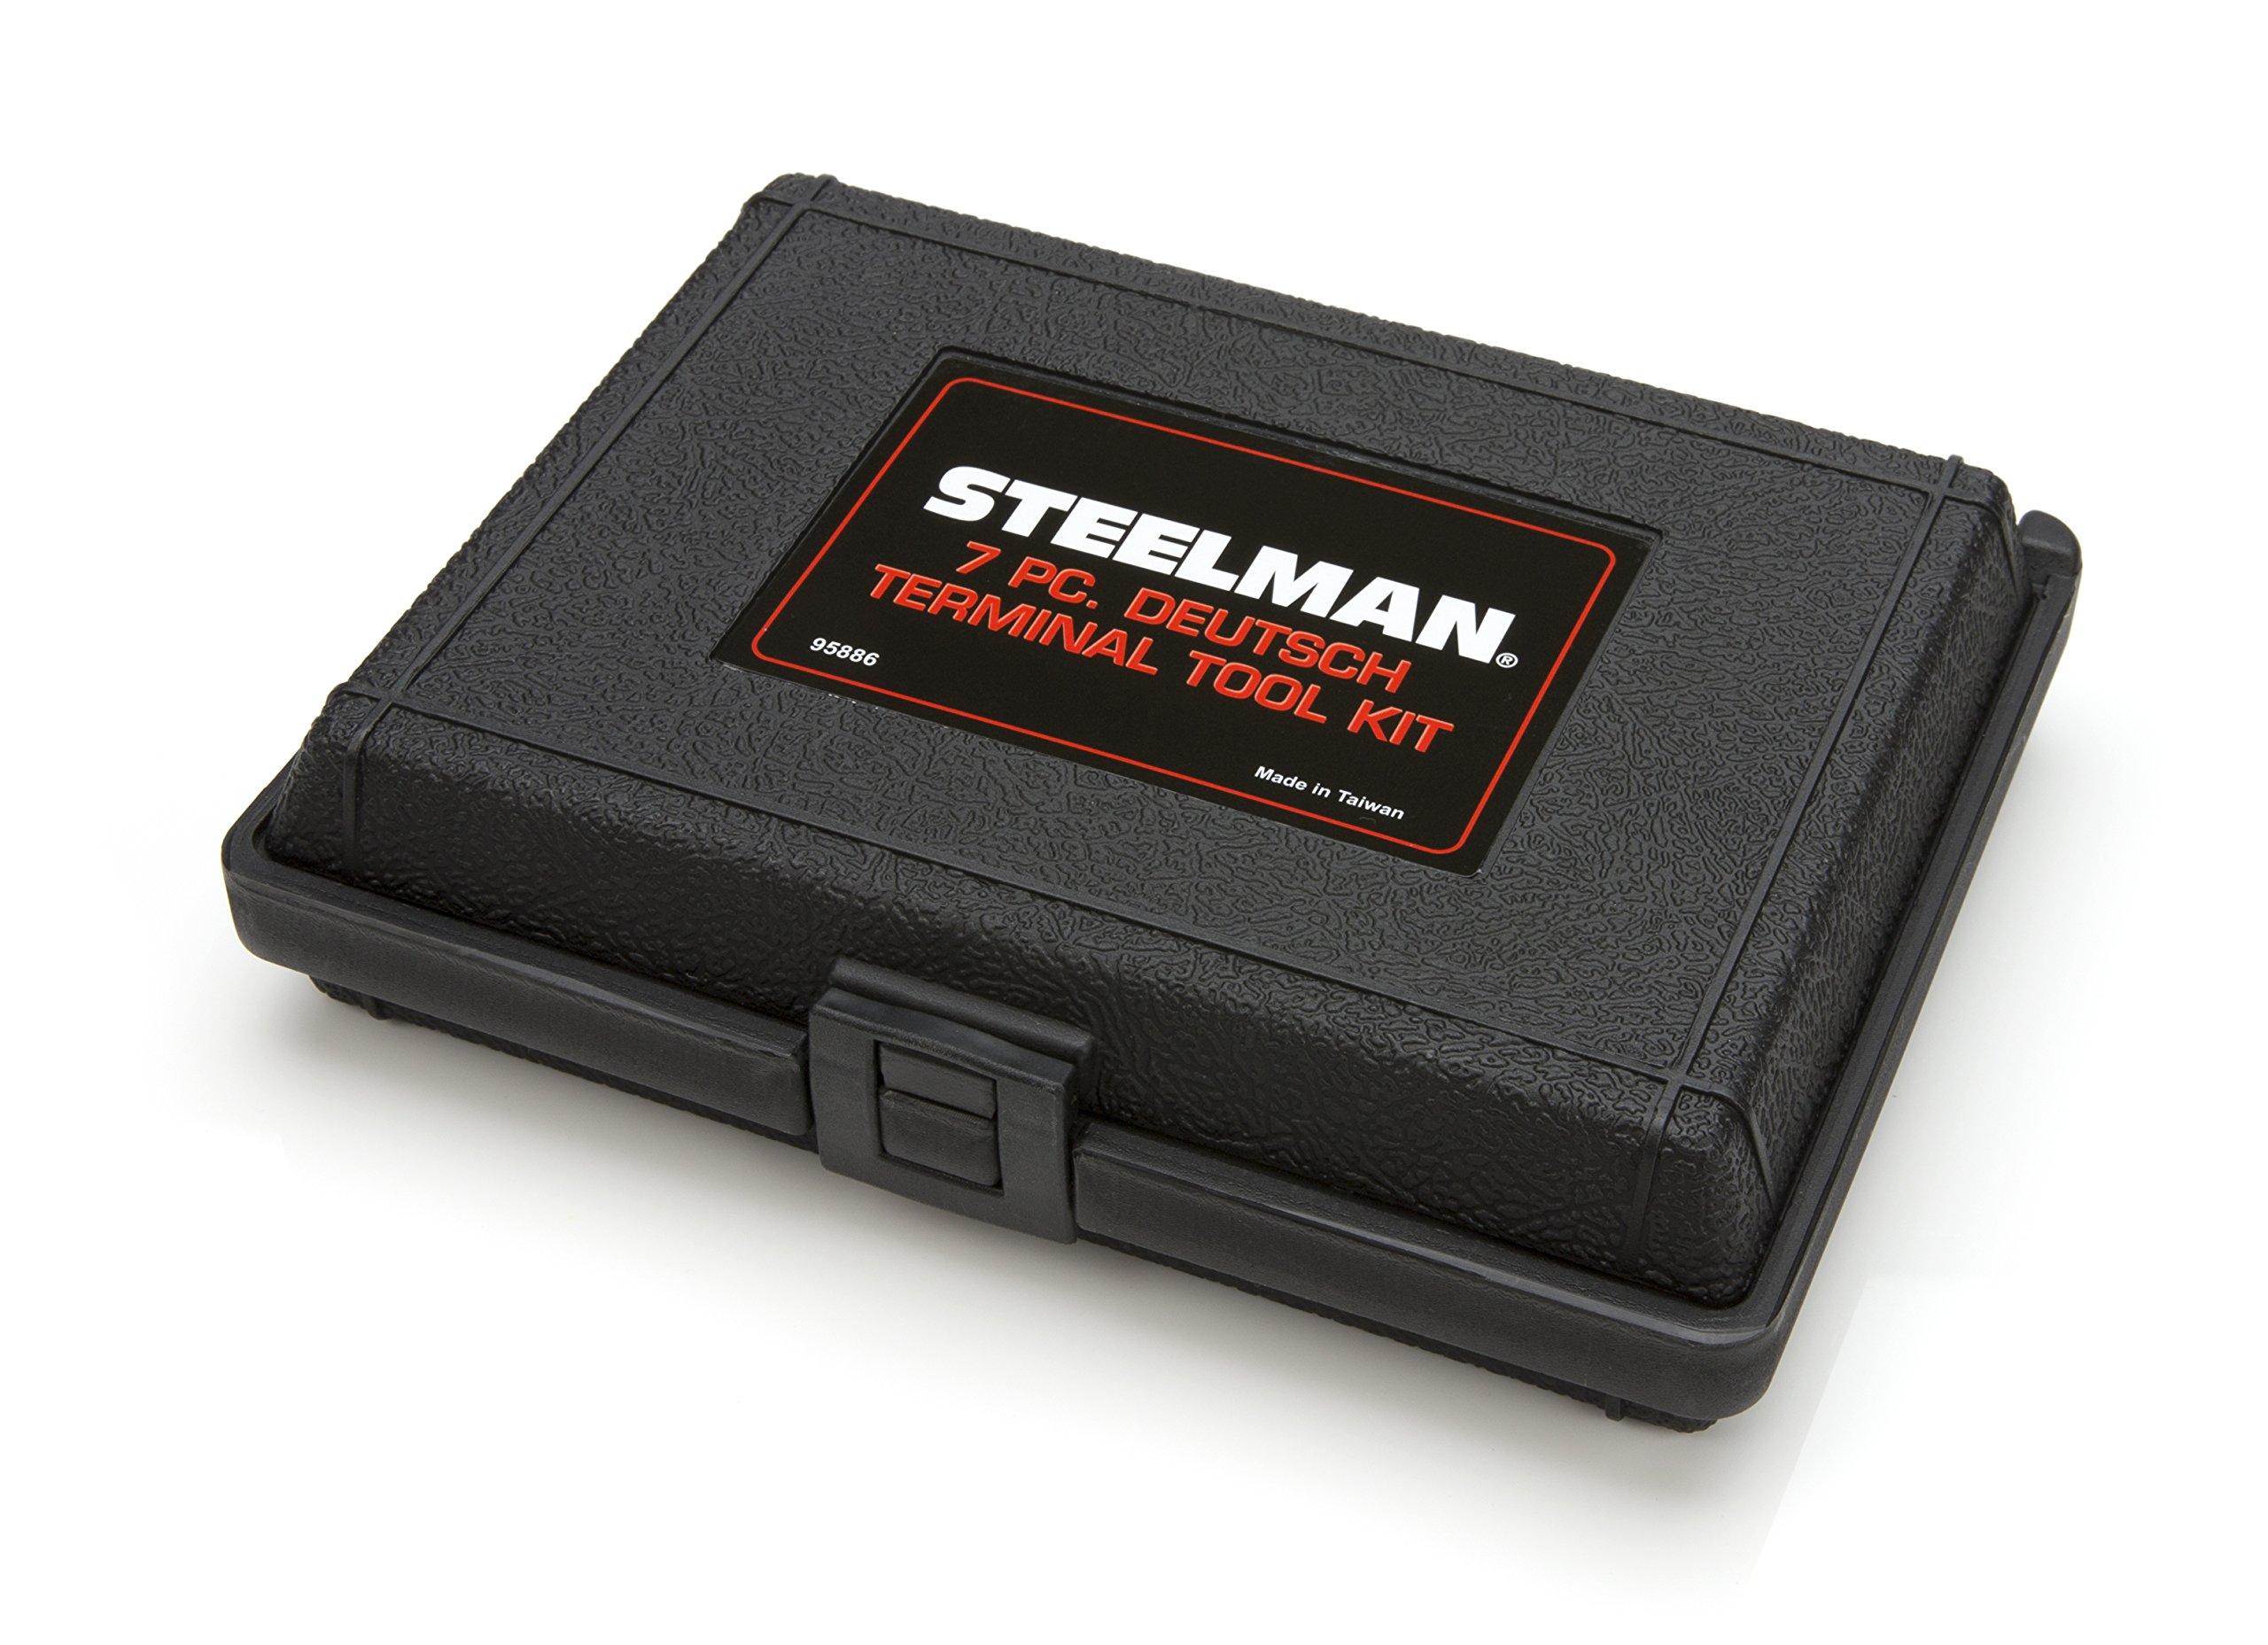 Steelman 95886 7-Piece Deutsch Terminal Tool Kit by Steelman (Image #4)